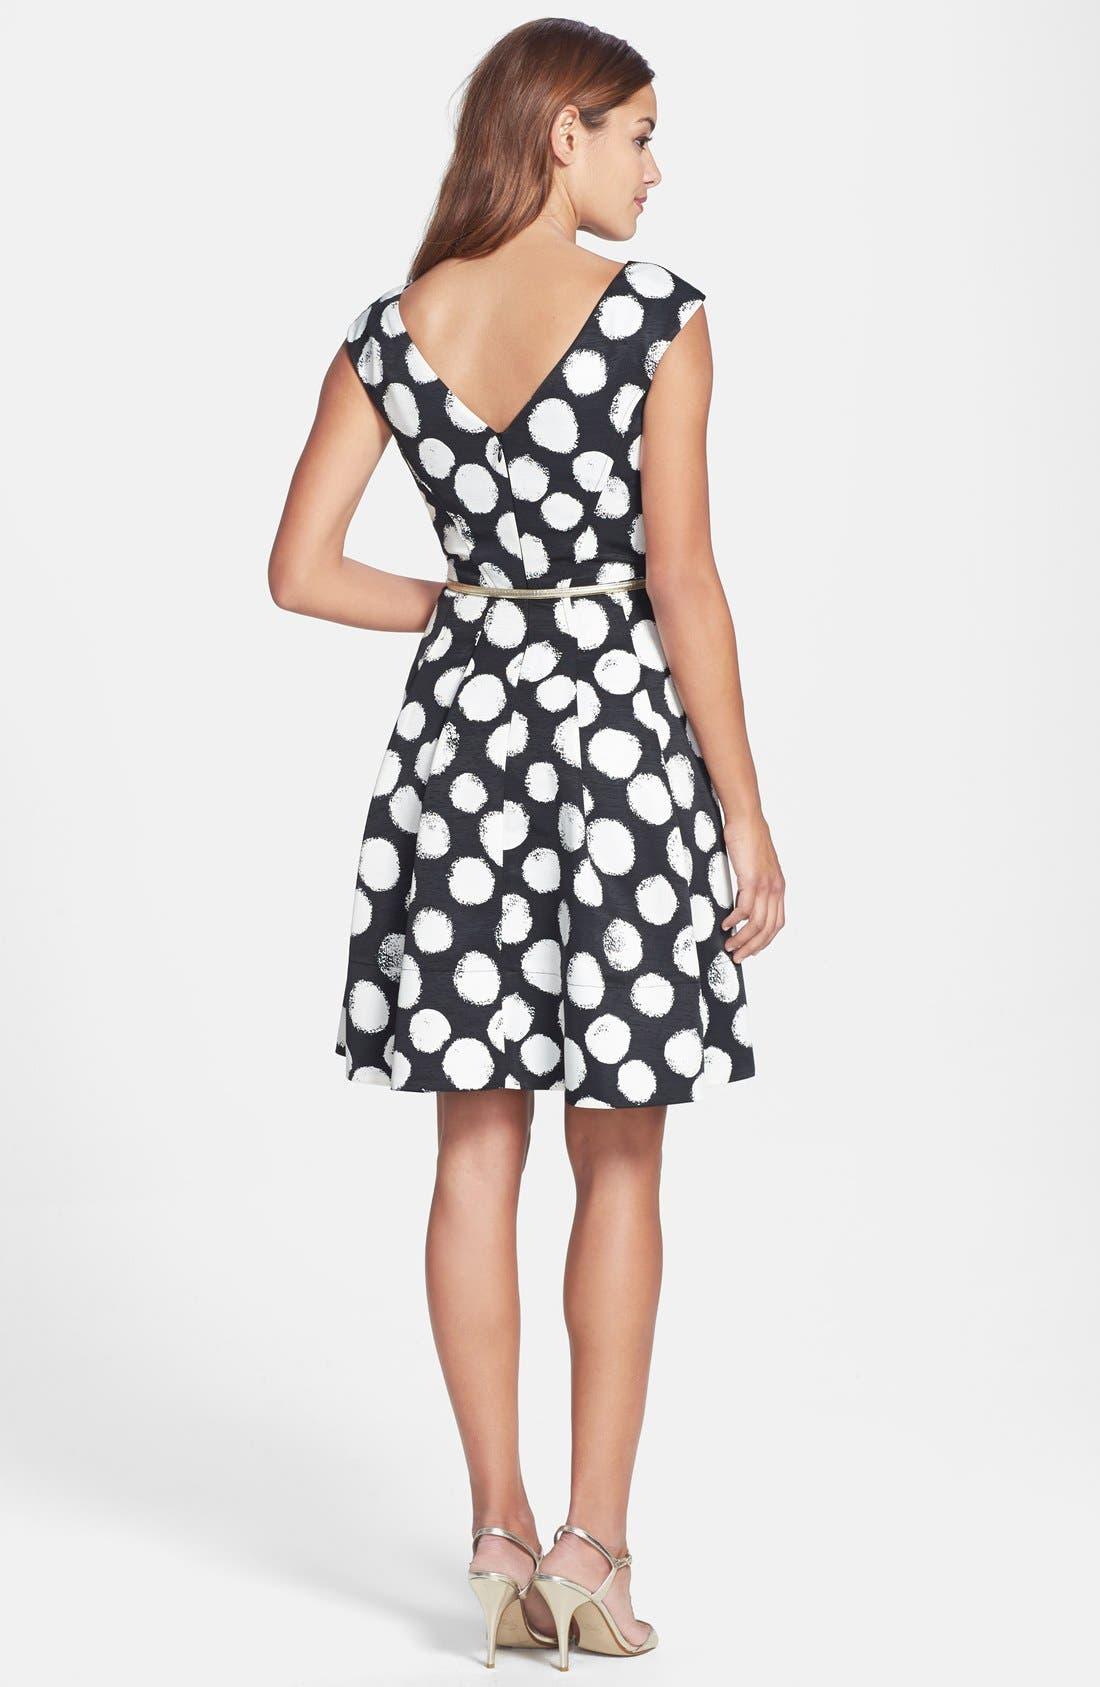 ELIZA J,                             Polka Dot Faille Fit & Flare Dress,                             Alternate thumbnail 4, color,                             001